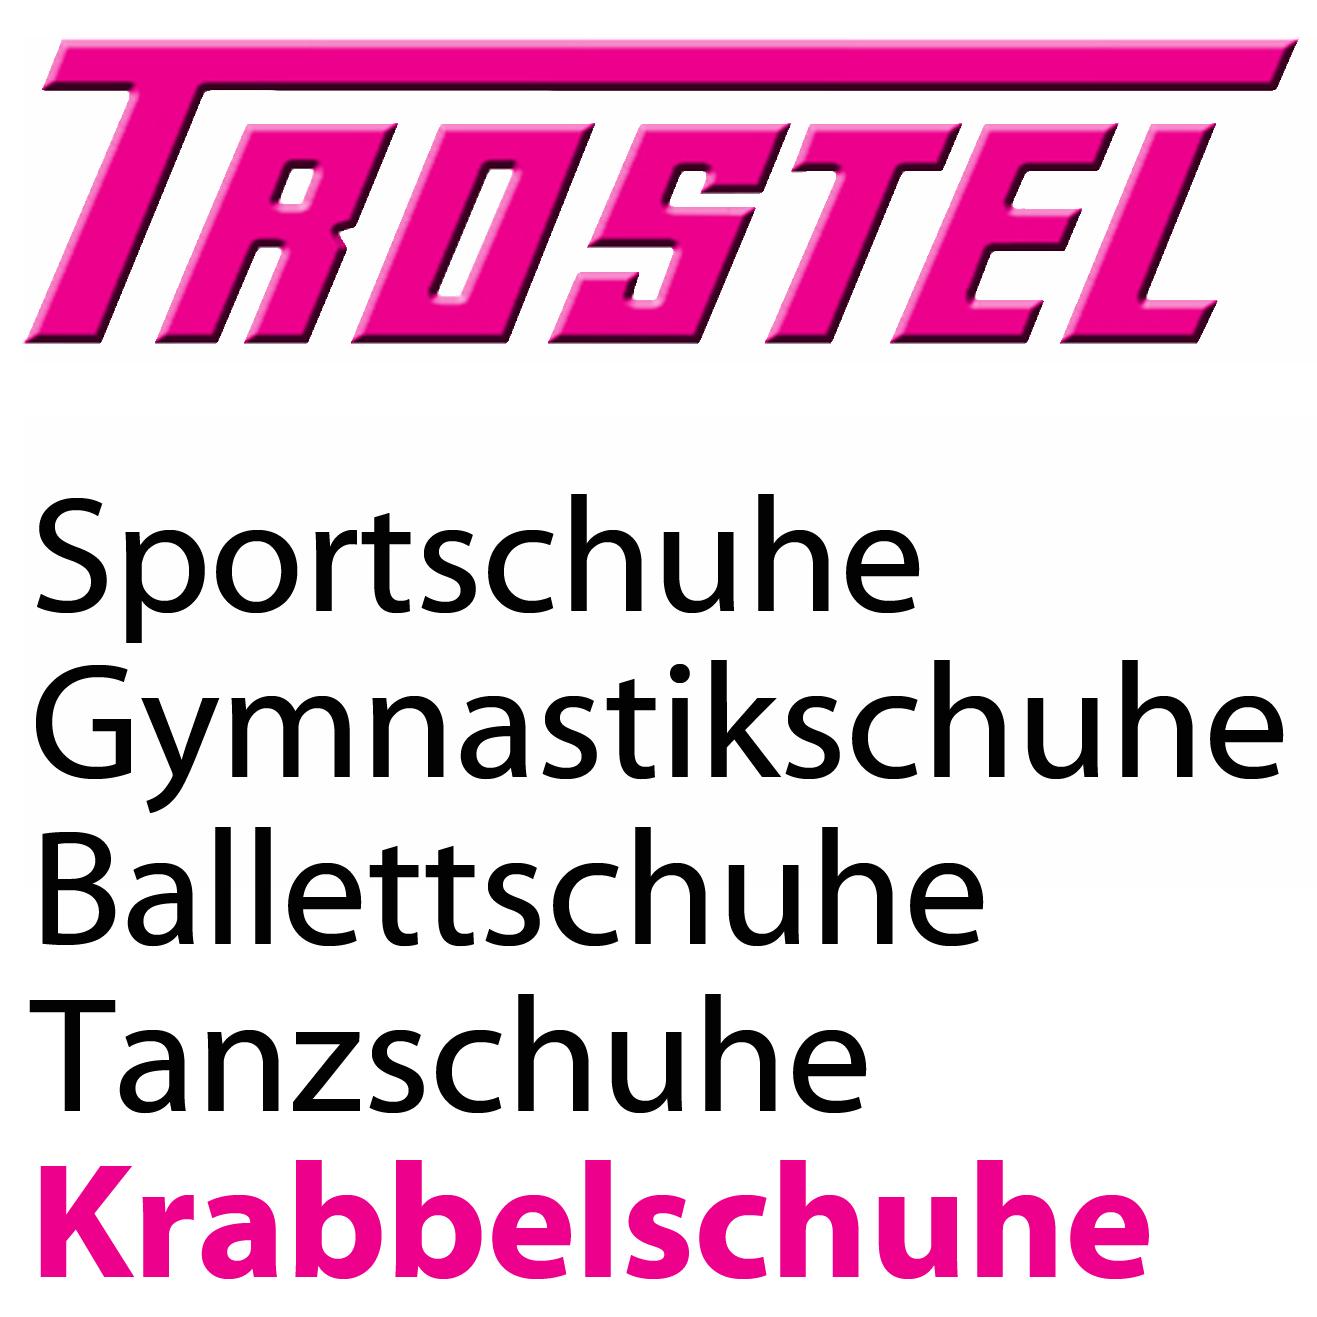 TROSTEL Sportschuhe GmbH